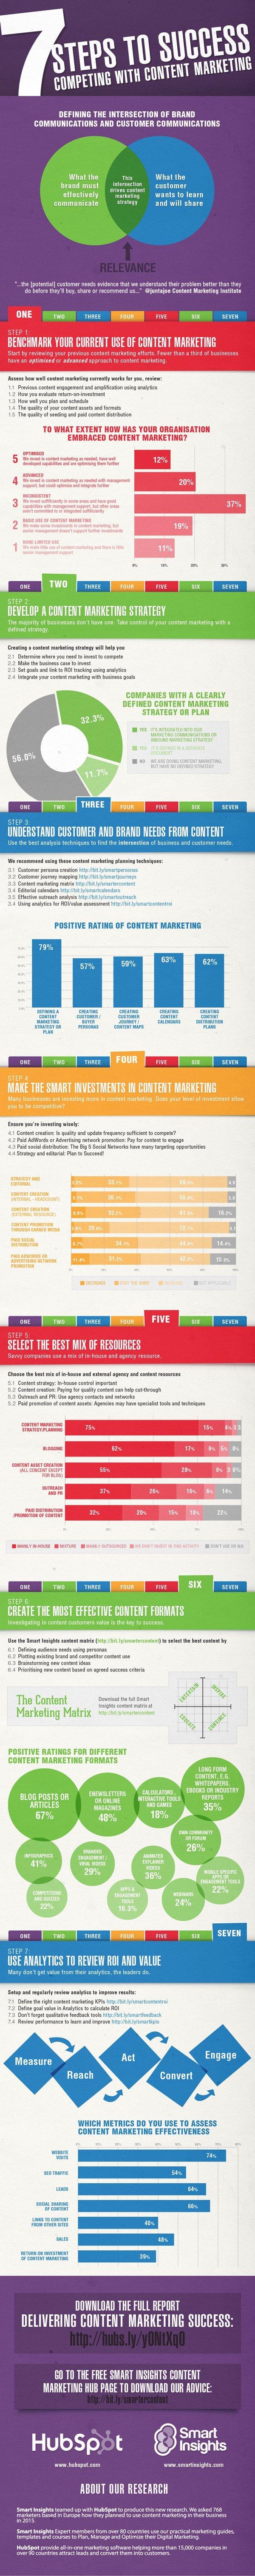 Content marketing success